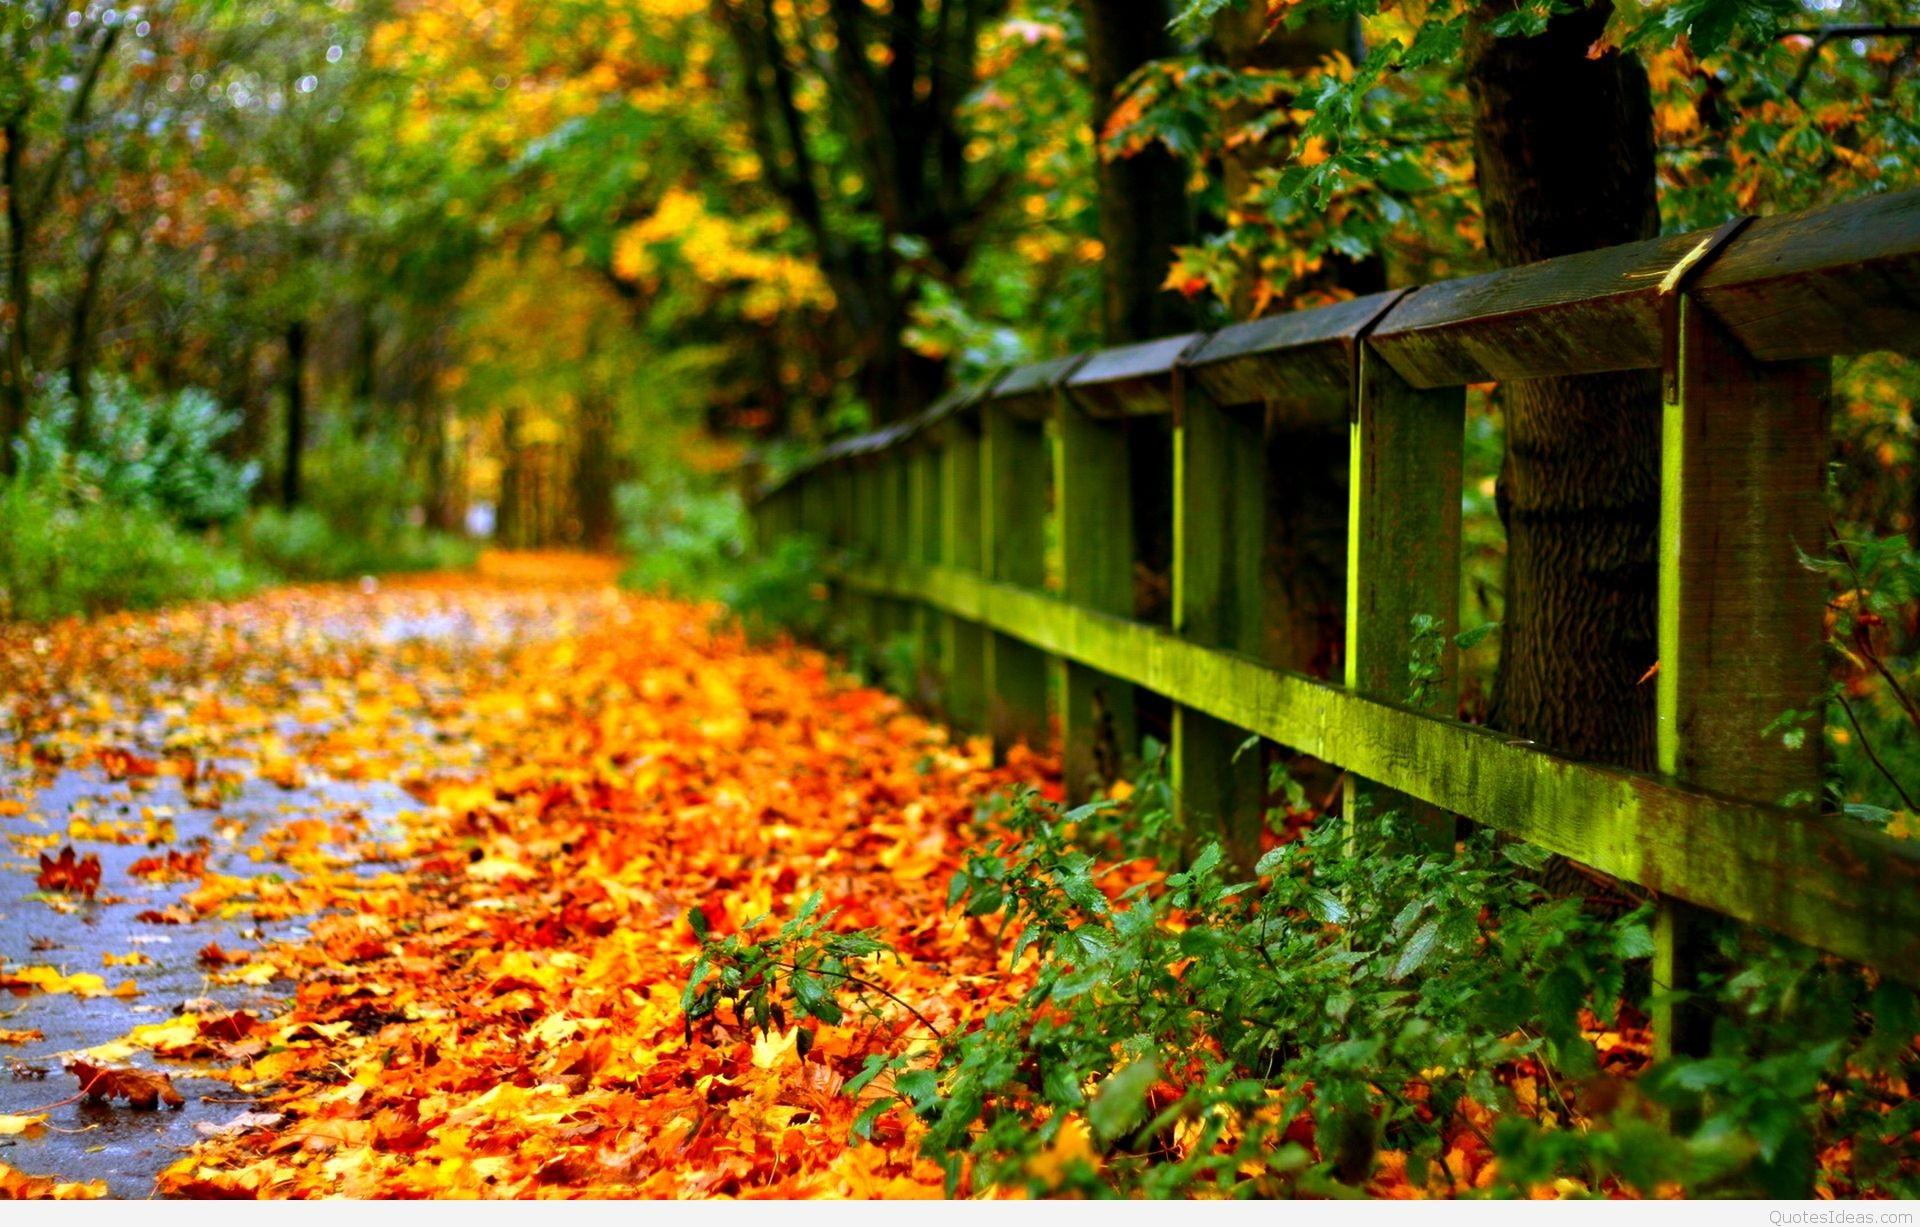 Autumn Wallpaper Widescreen ·① Download Free Amazing High